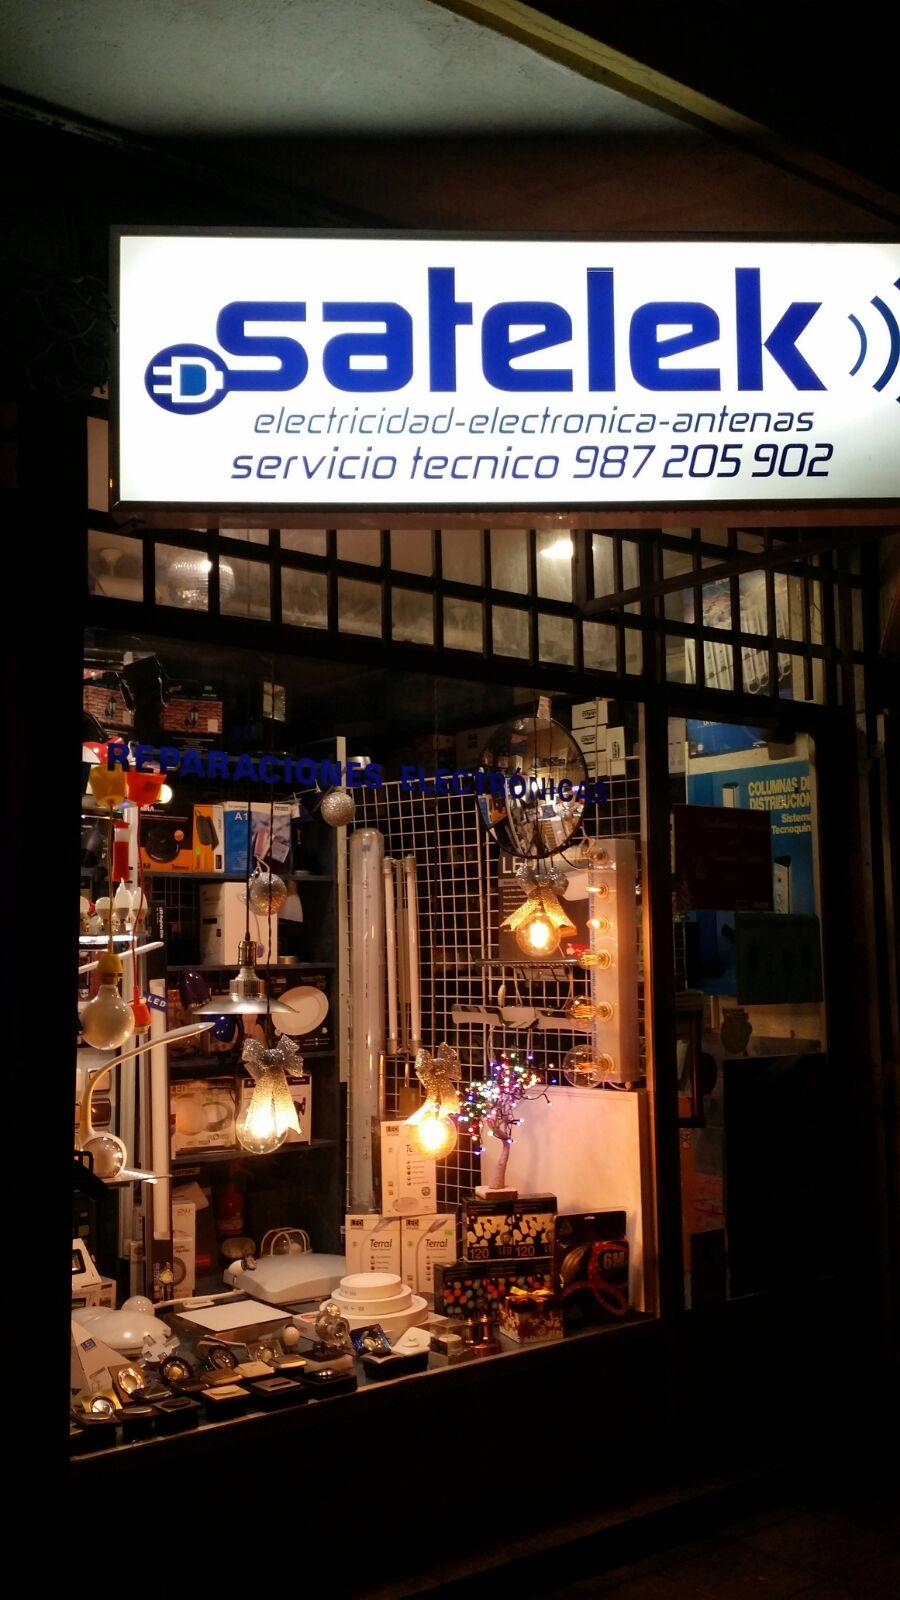 Satelek - Electricidad